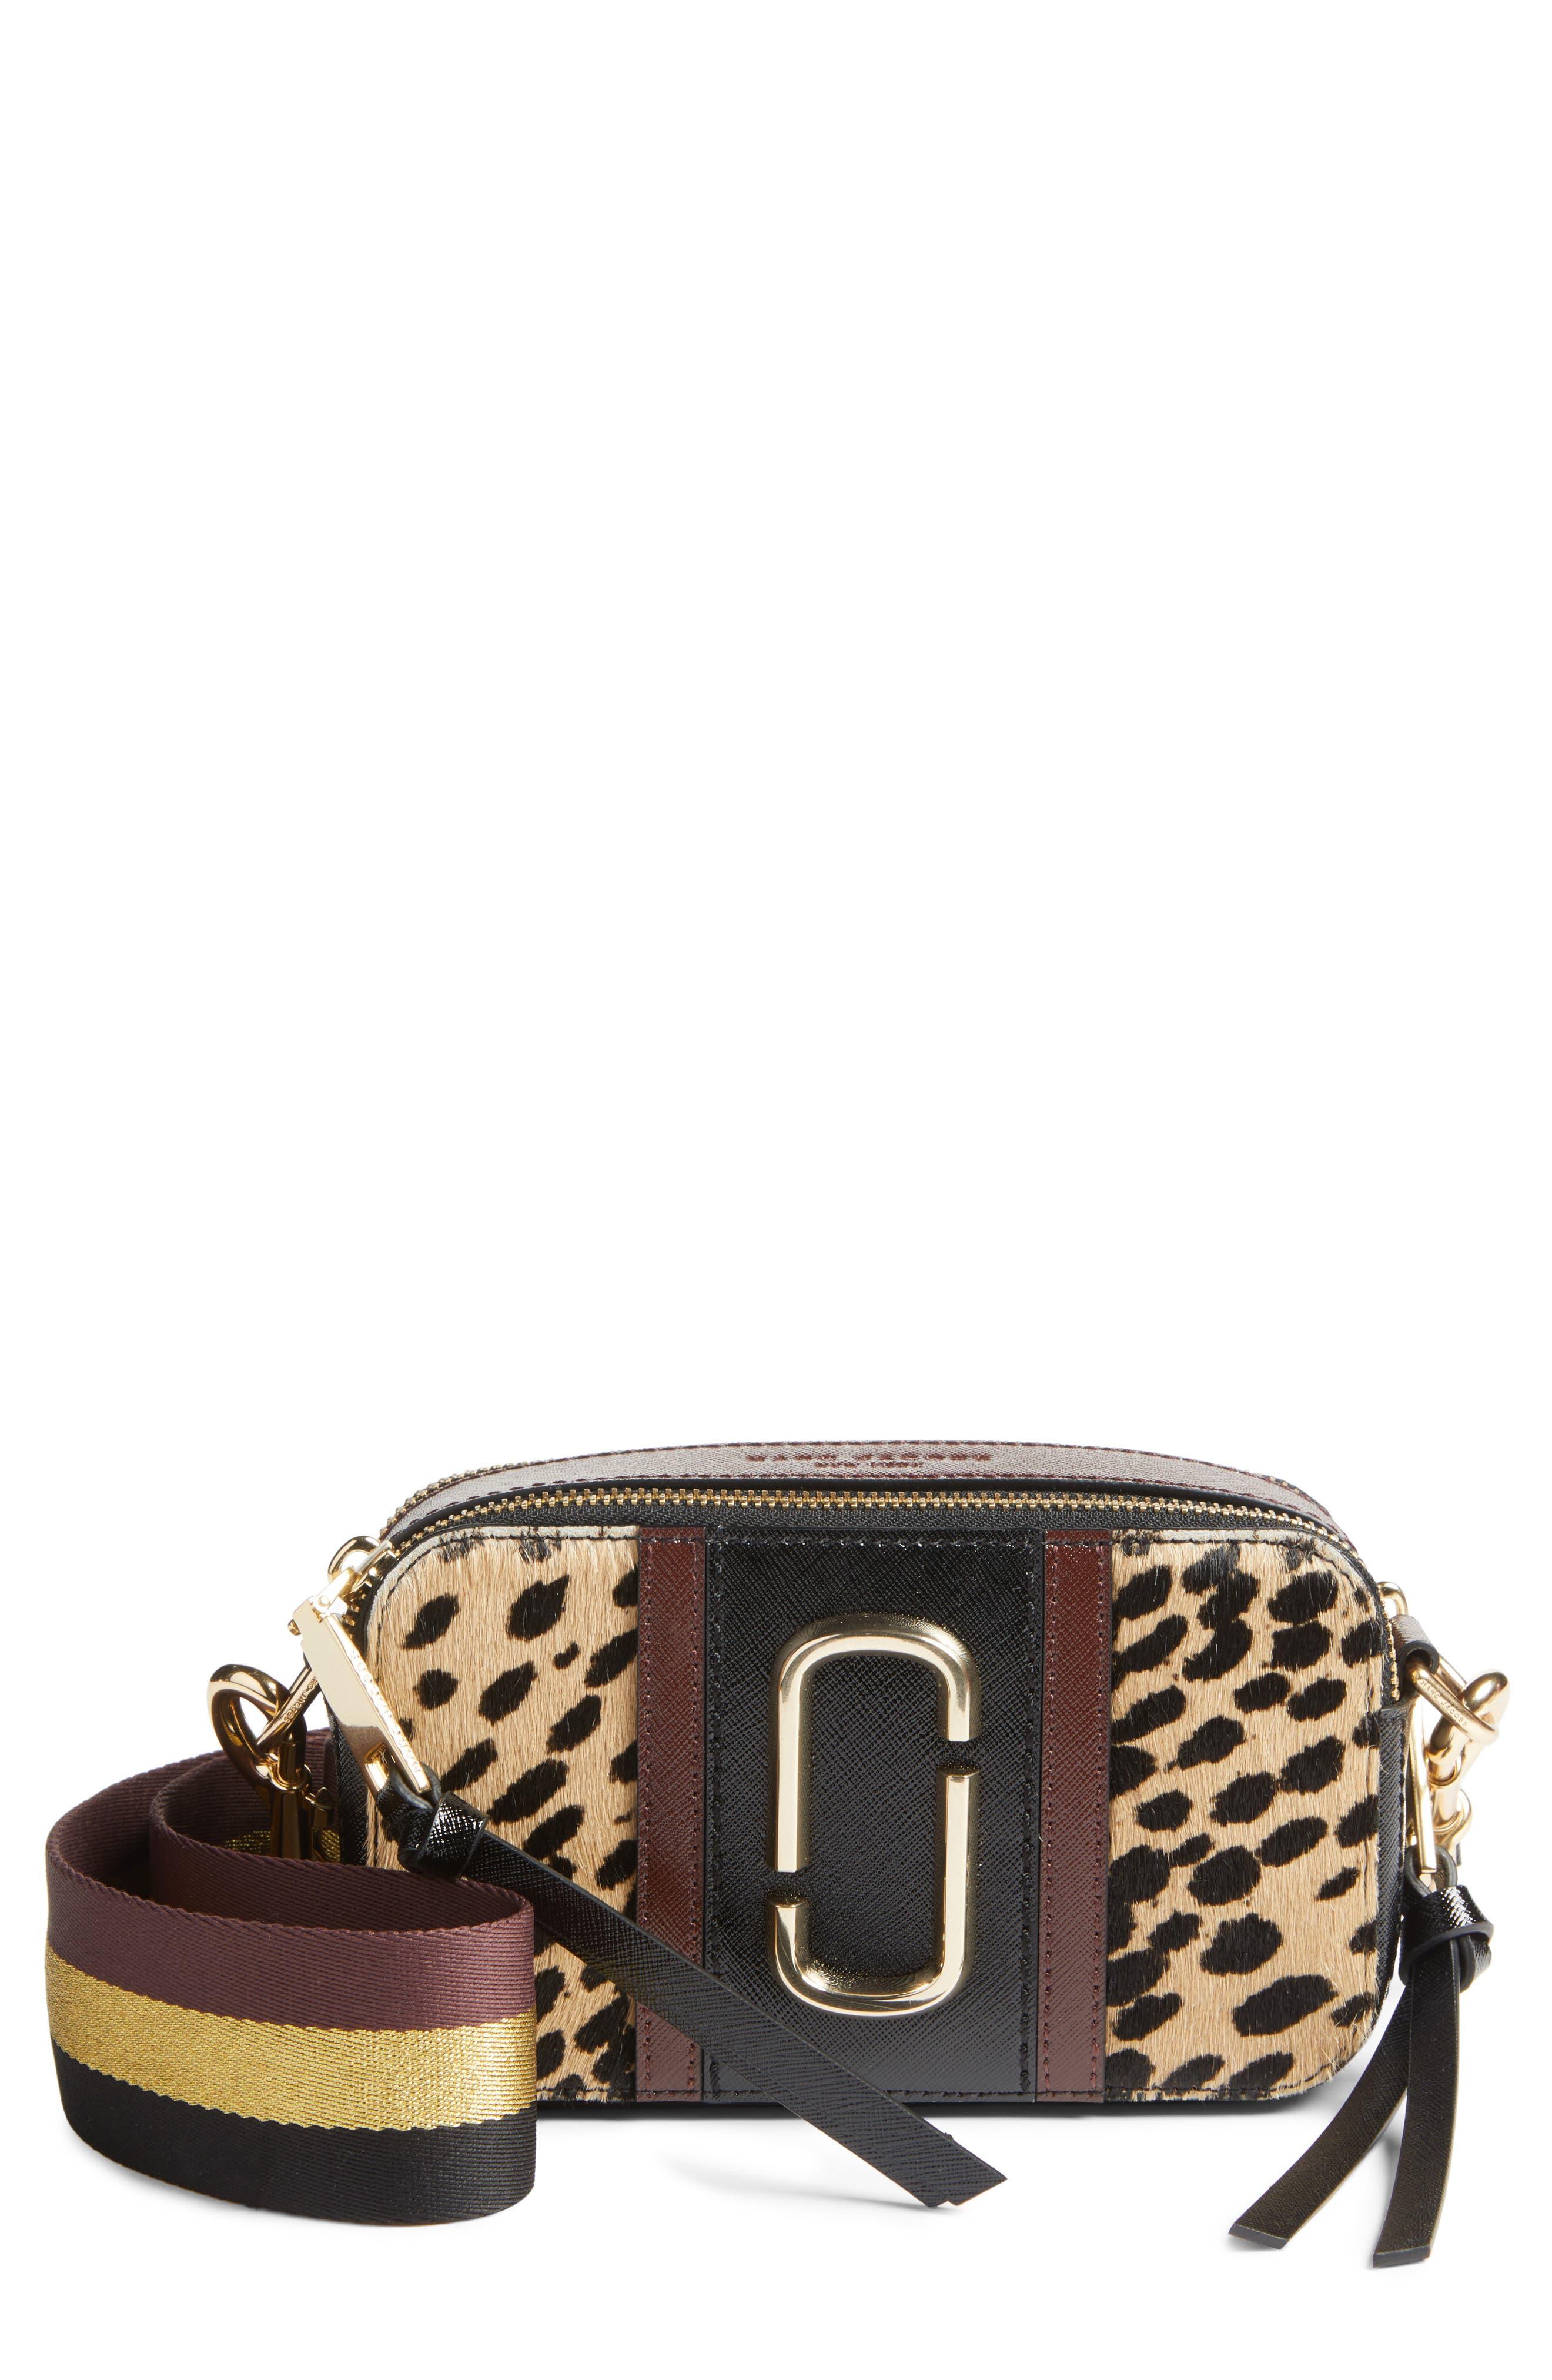 Snapshot Leopard Crossbody Bag,                             Main thumbnail 1, color,                             002